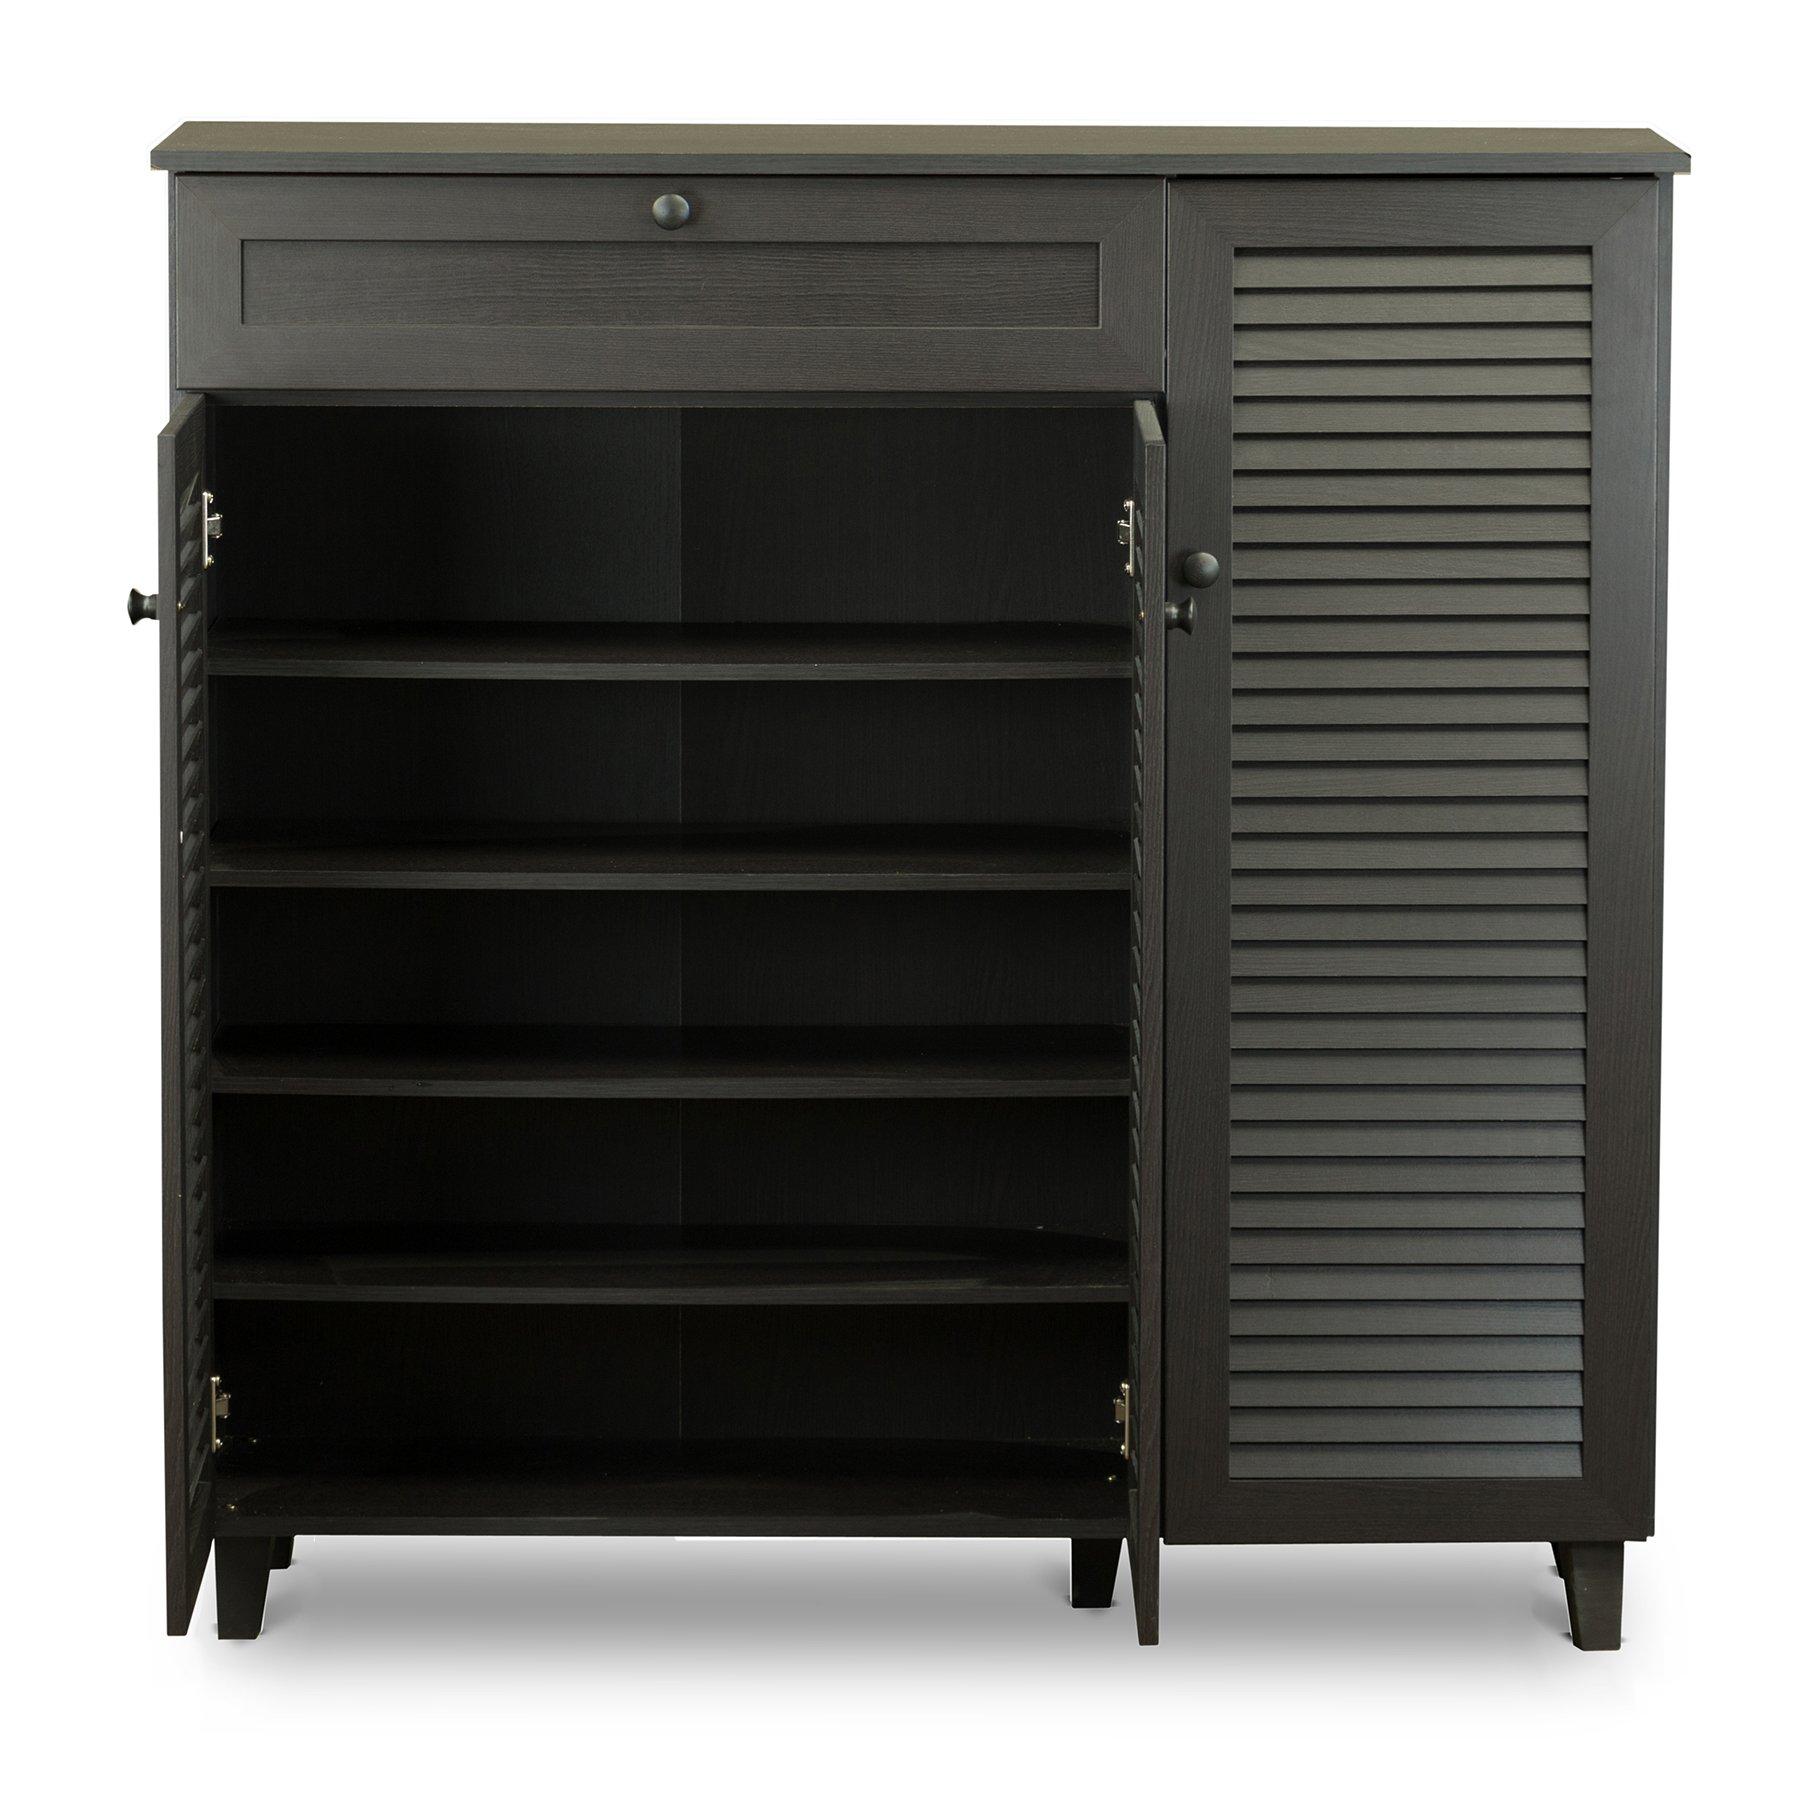 Baxton Studio Pocillo Wood Shoe Storage Cabinet, Brown by Baxton Studio (Image #4)